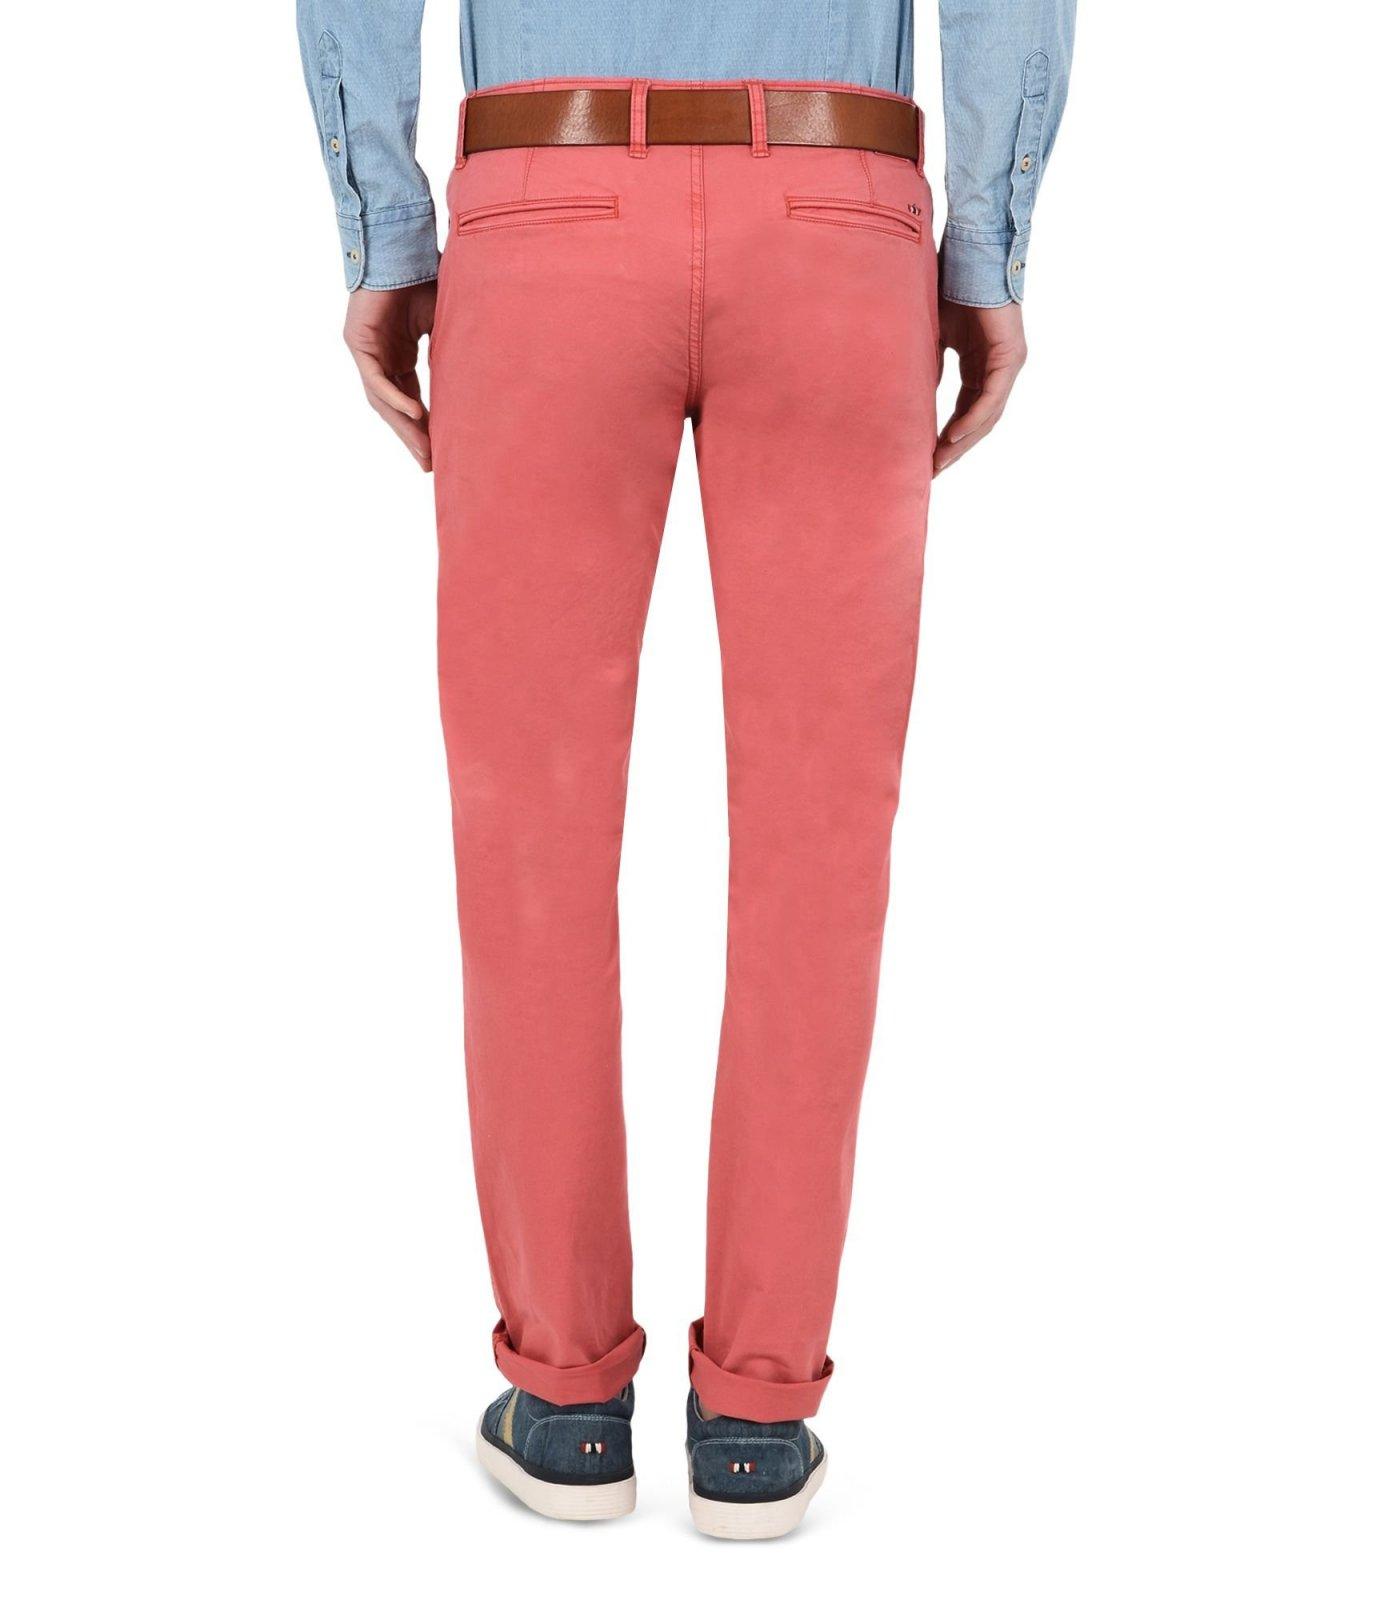 Chino Pantalon Strech Orange Pour Napapijri Homme Mana d5wS1